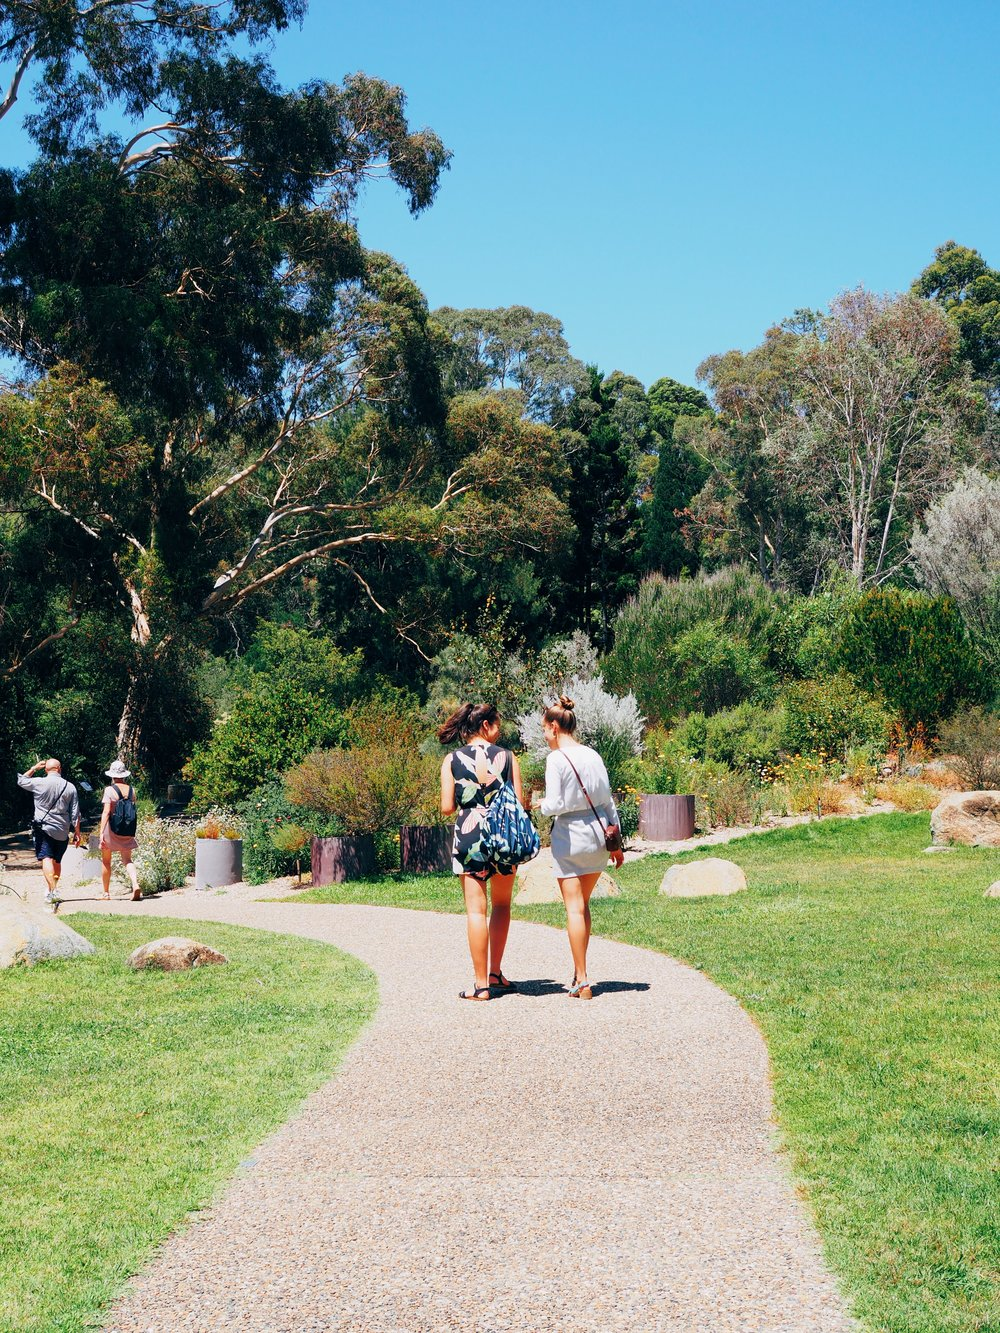 Walking around the Botanic Gardens